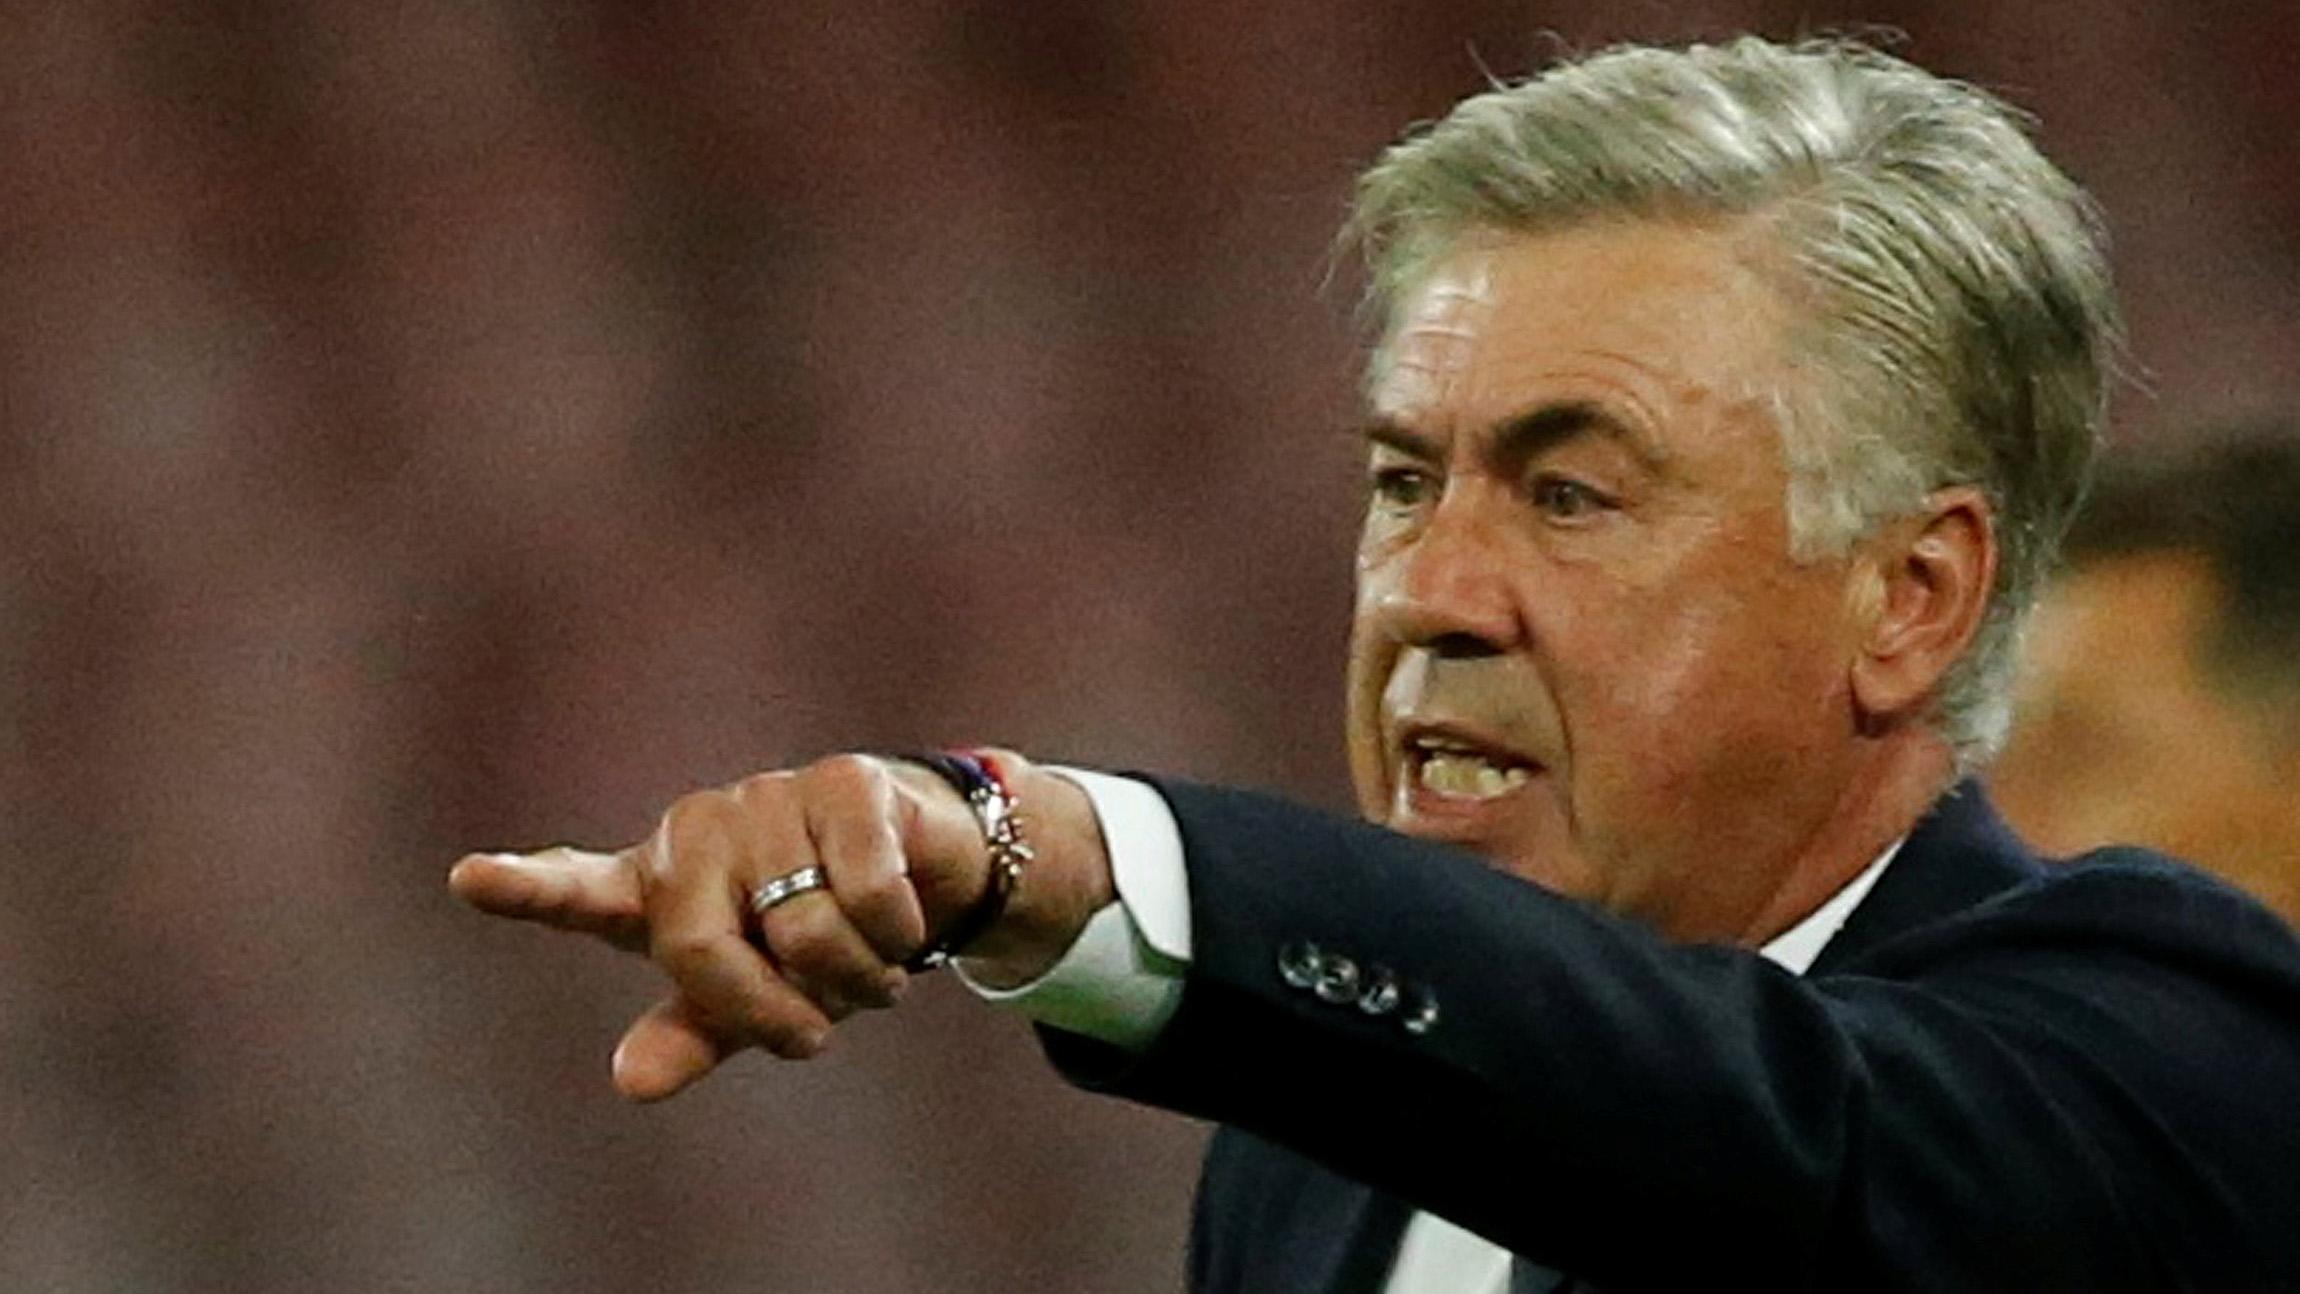 Carlo Ancelotti points 1280.jpg